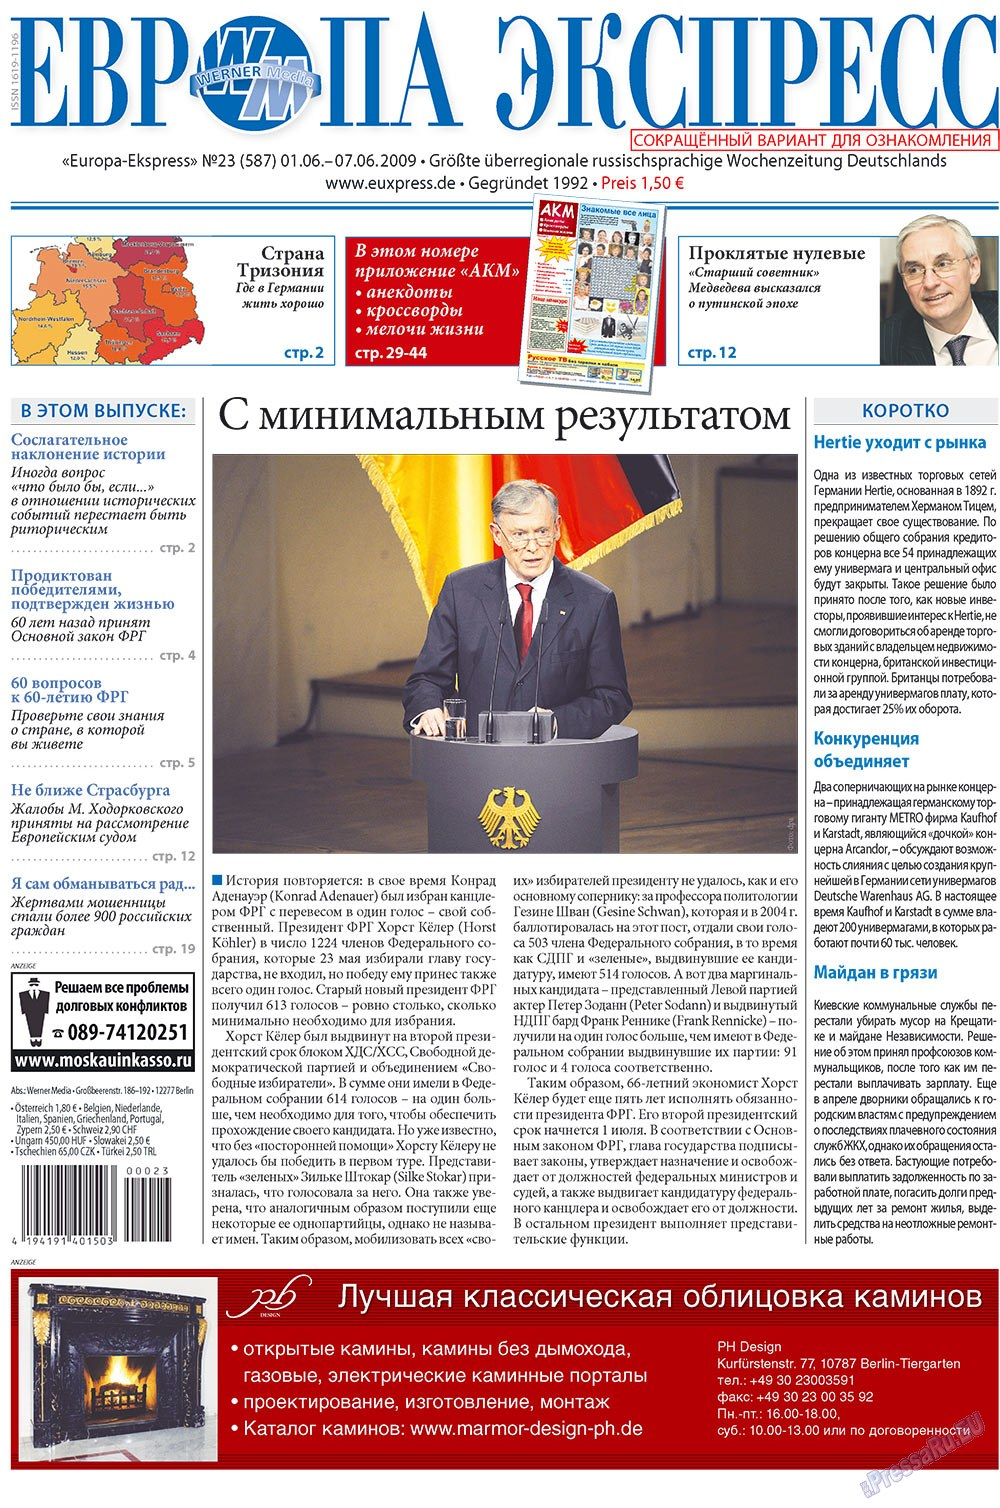 Европа экспресс (газета). 2009 год, номер 23, стр. 1